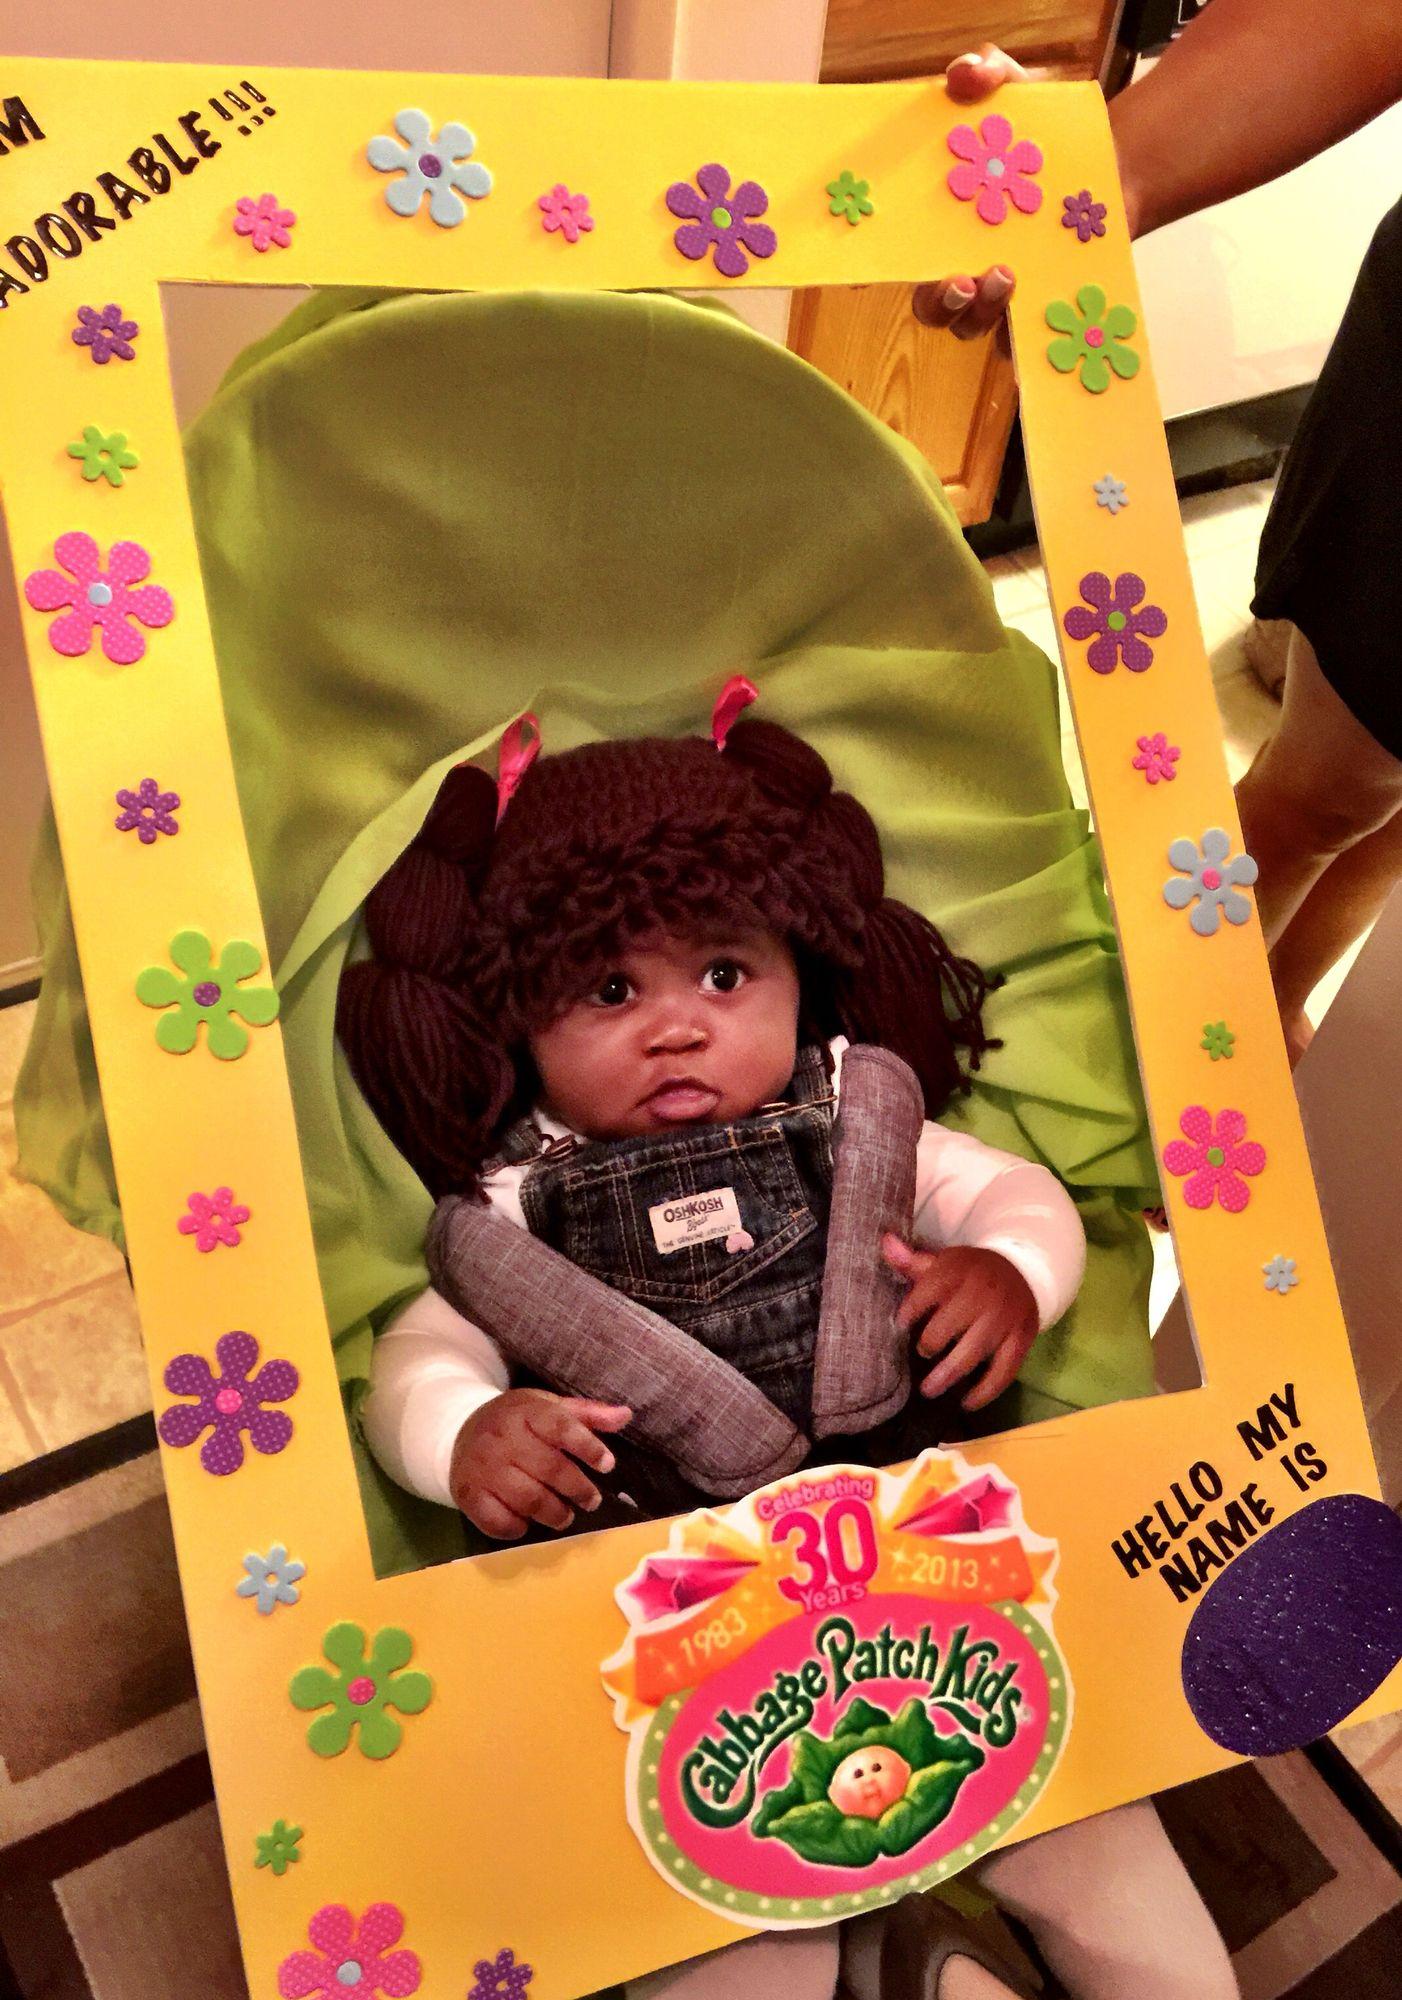 Cabbage Patch Kid Costume #InfantHalloweenCostume